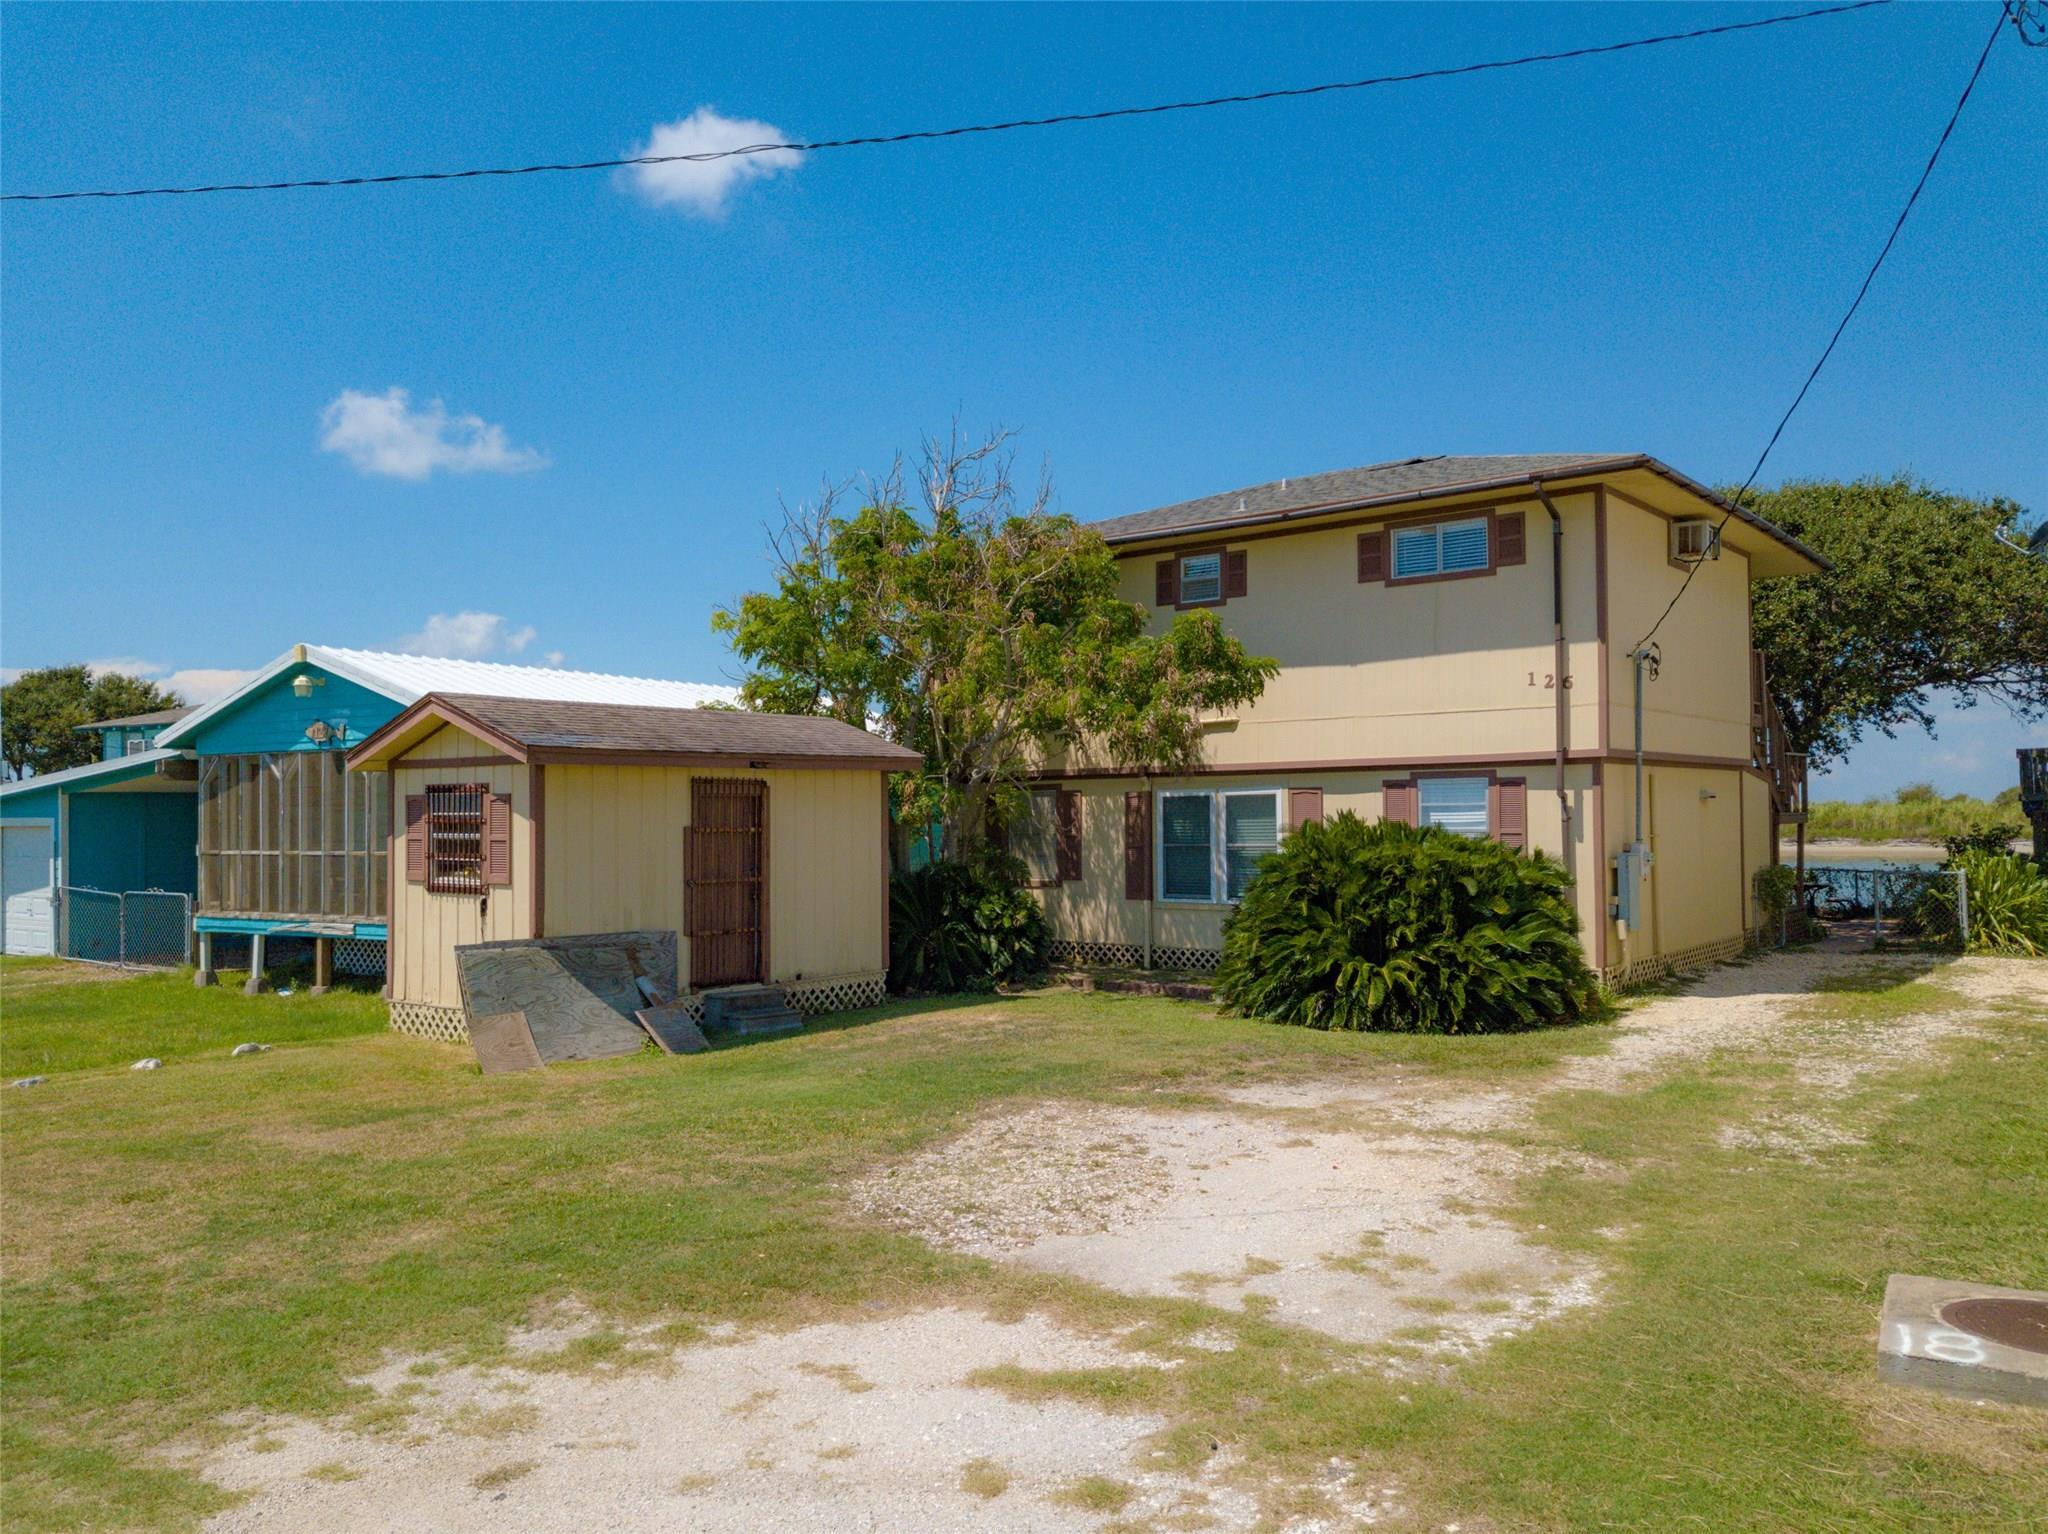 3804 Fm 2031 Property Photo - Matagorda, TX real estate listing